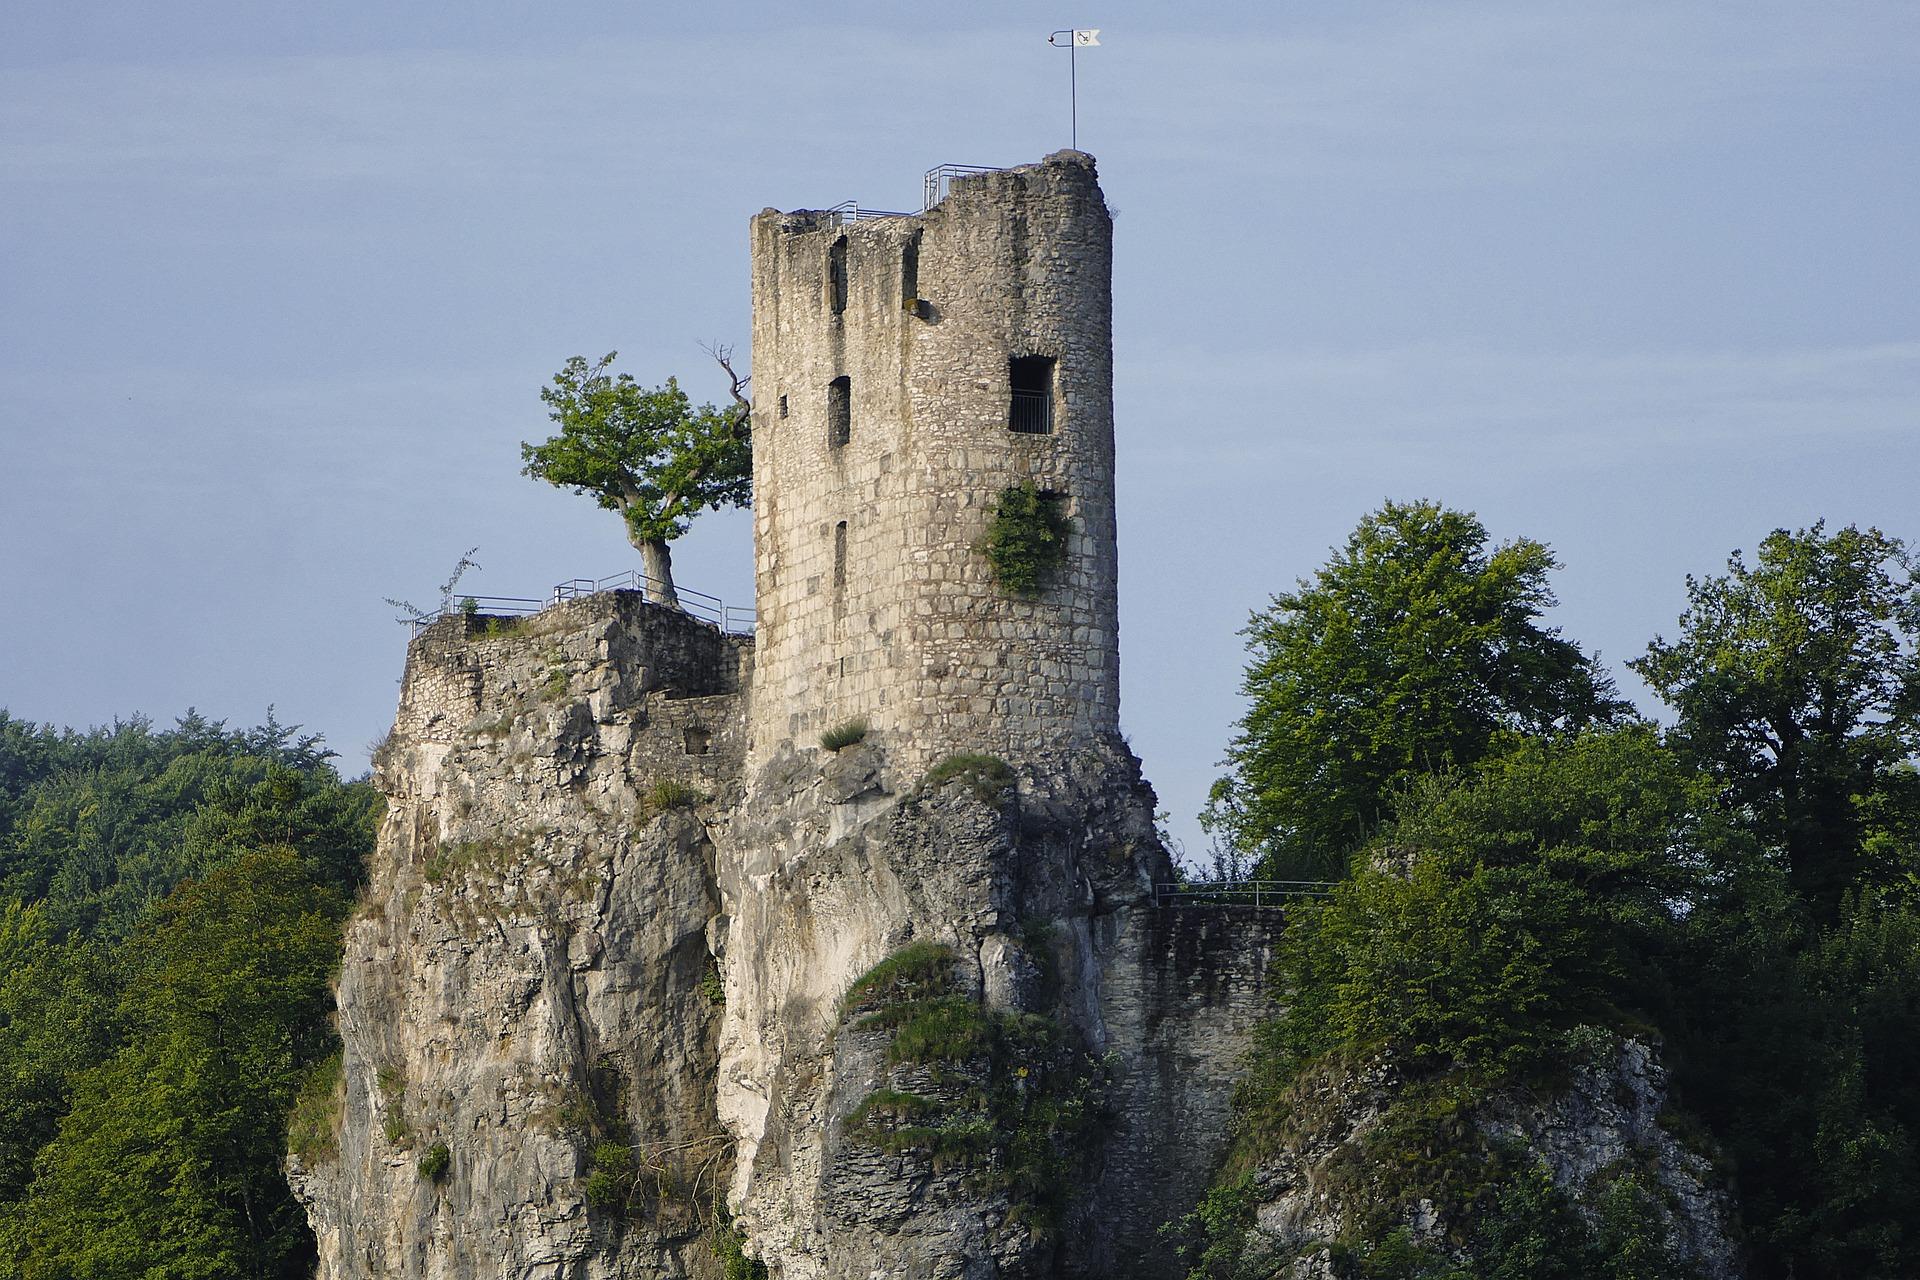 Burgruine Neideck